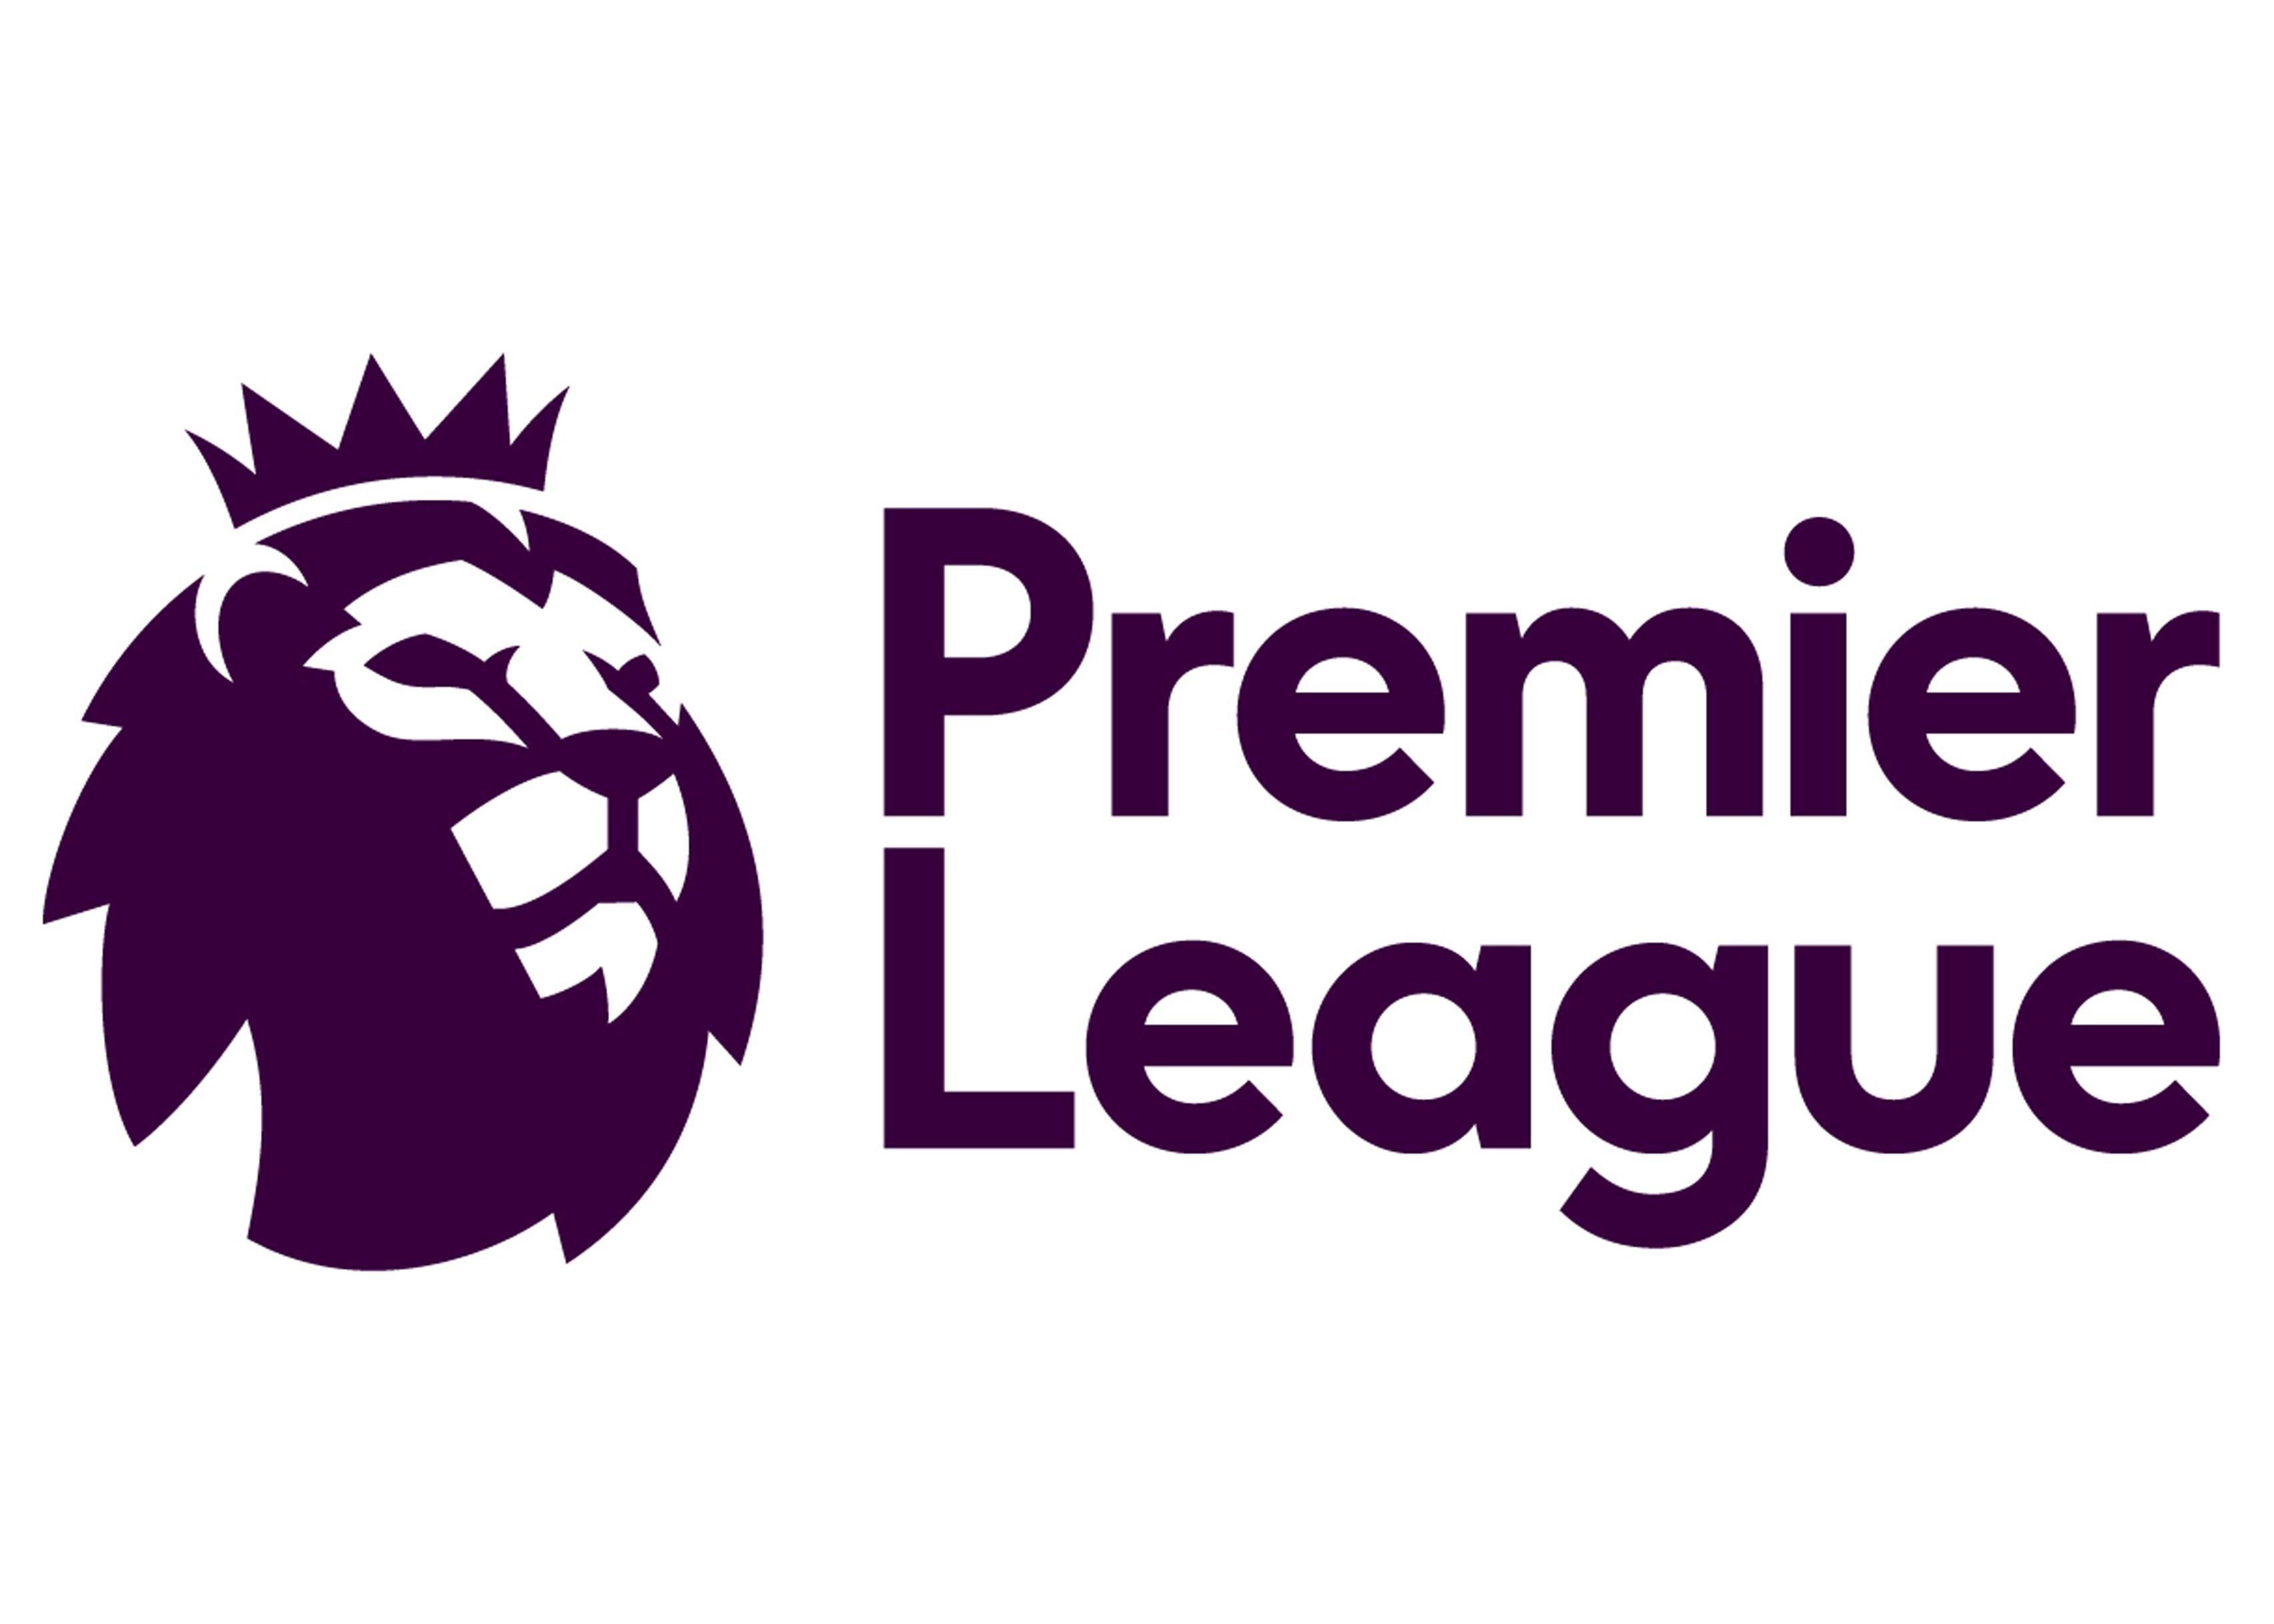 UK Premier League gets a minimal rebrand by DesignStudio